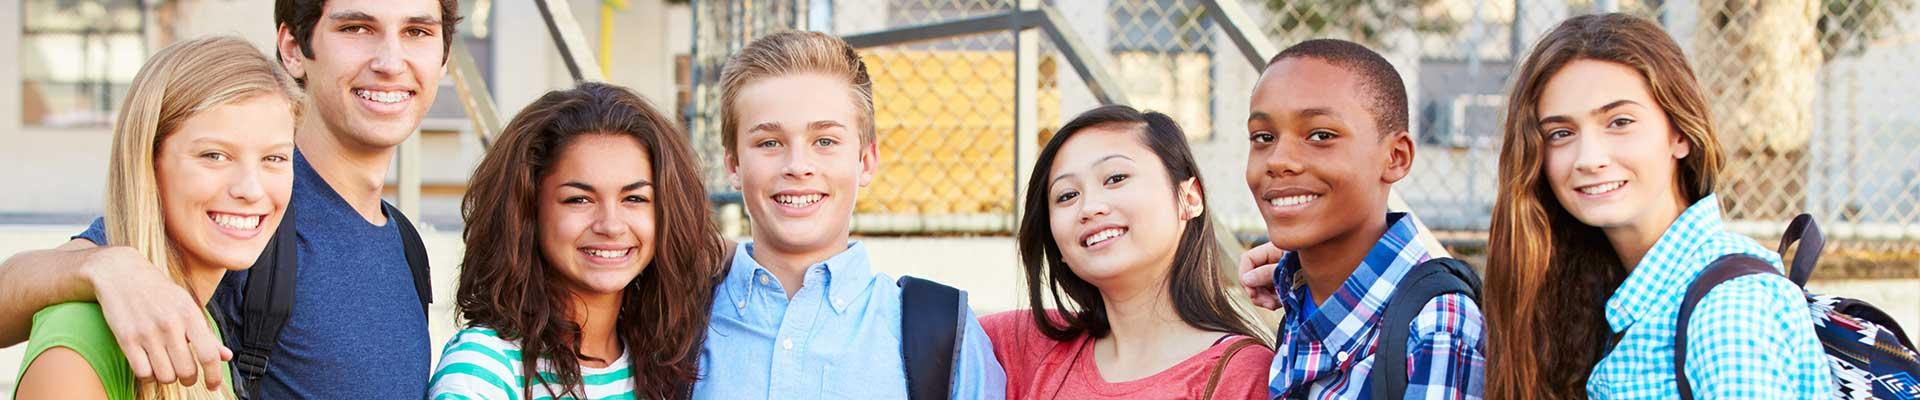 Adolescent Orthodontics Orthodontics at Don Mills in Toronto, ON